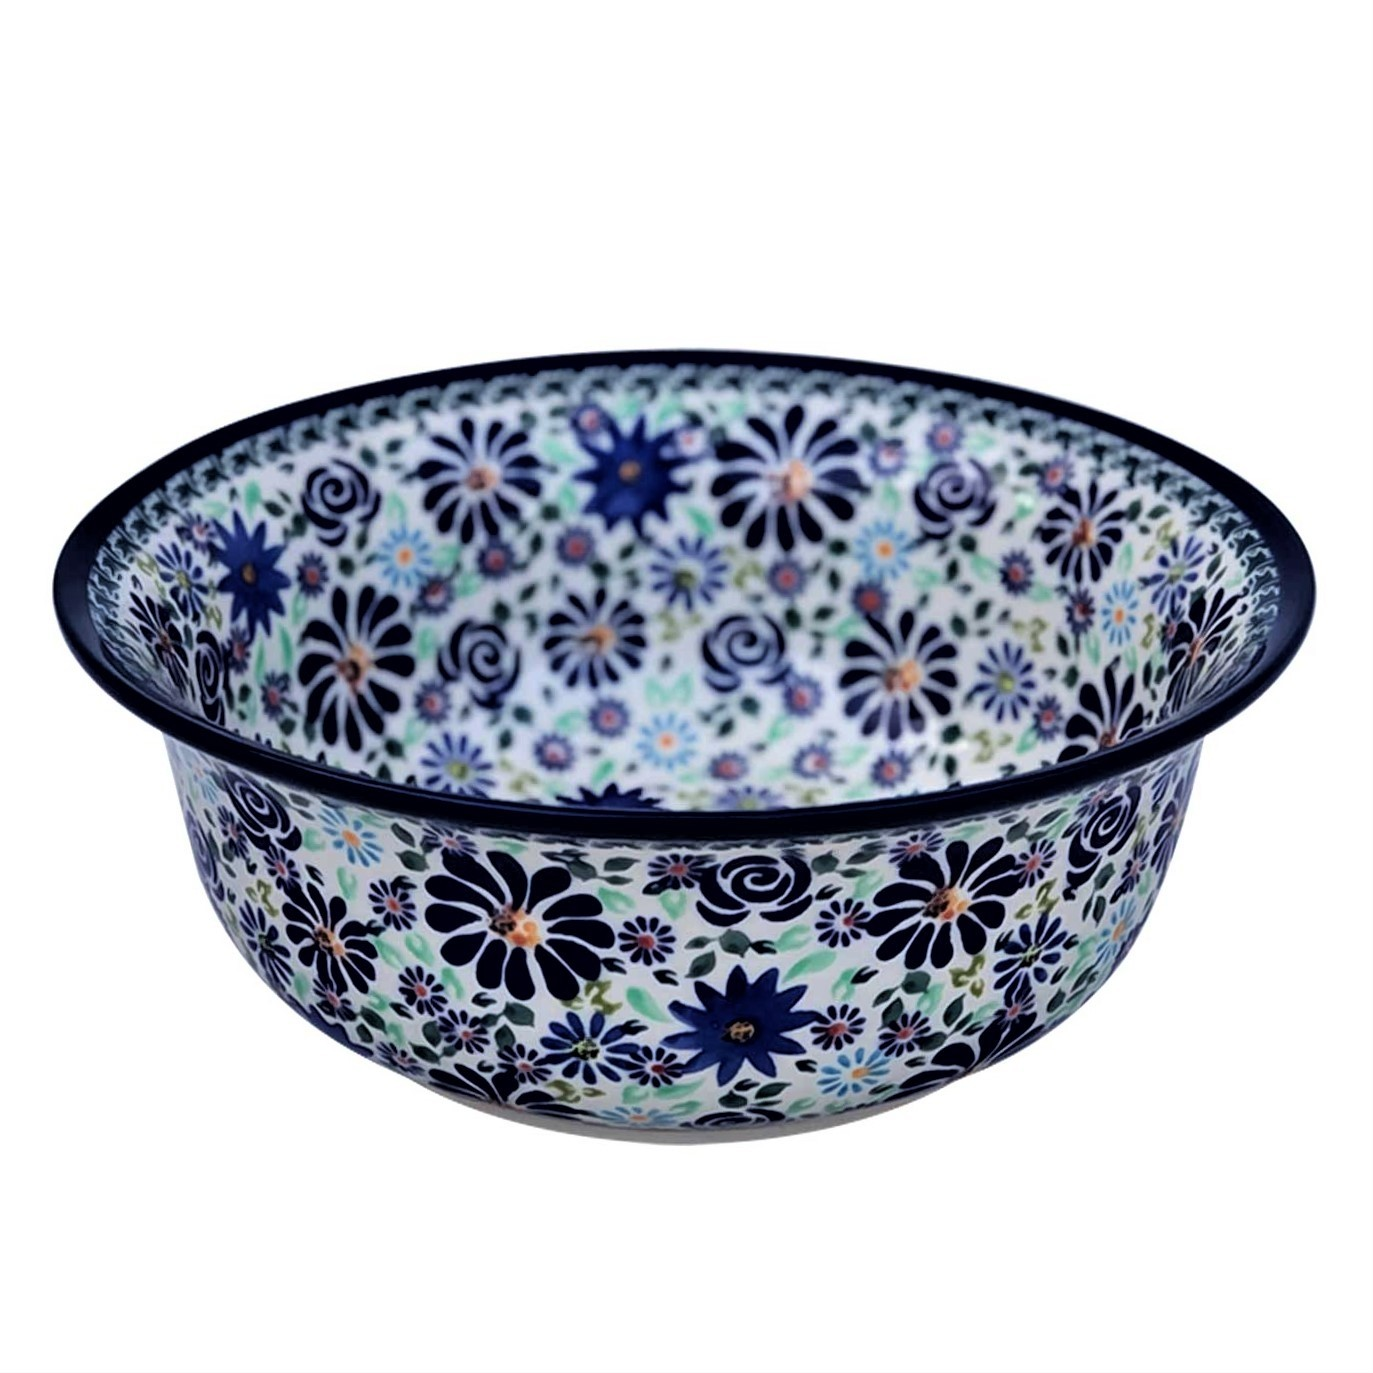 Polish Pottery 4TH OF JULY 61-oz Flared Top Stoneware Bowl - 1605-DU126